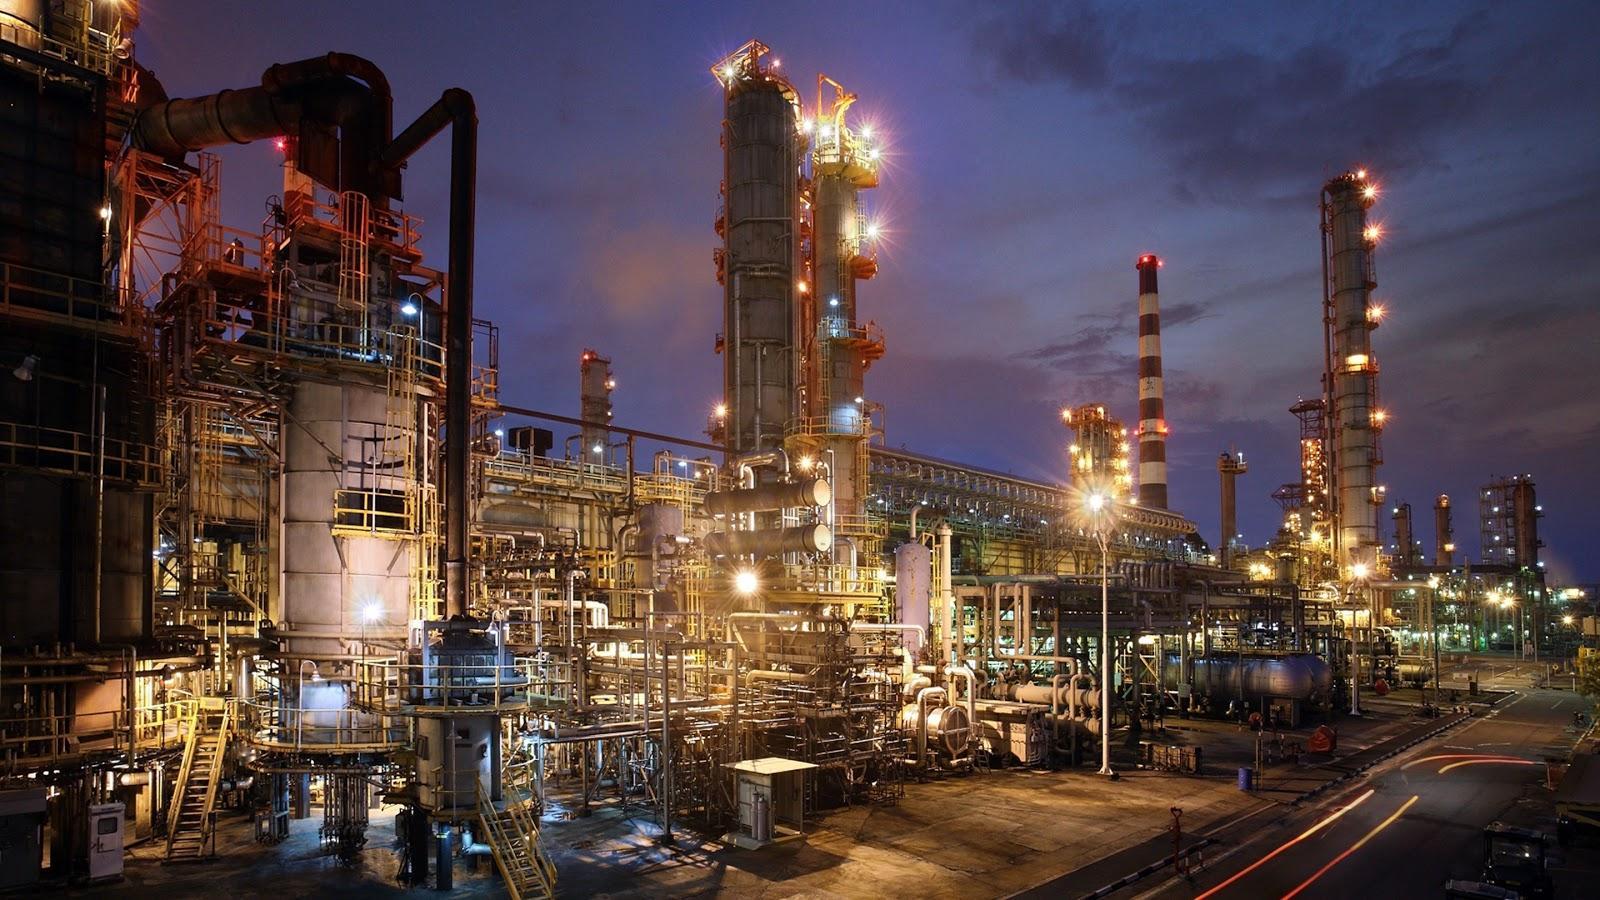 Koshinski Asset Management Inc. Sells 3332 Shares of Exxon Mobil Corporation (XOM)